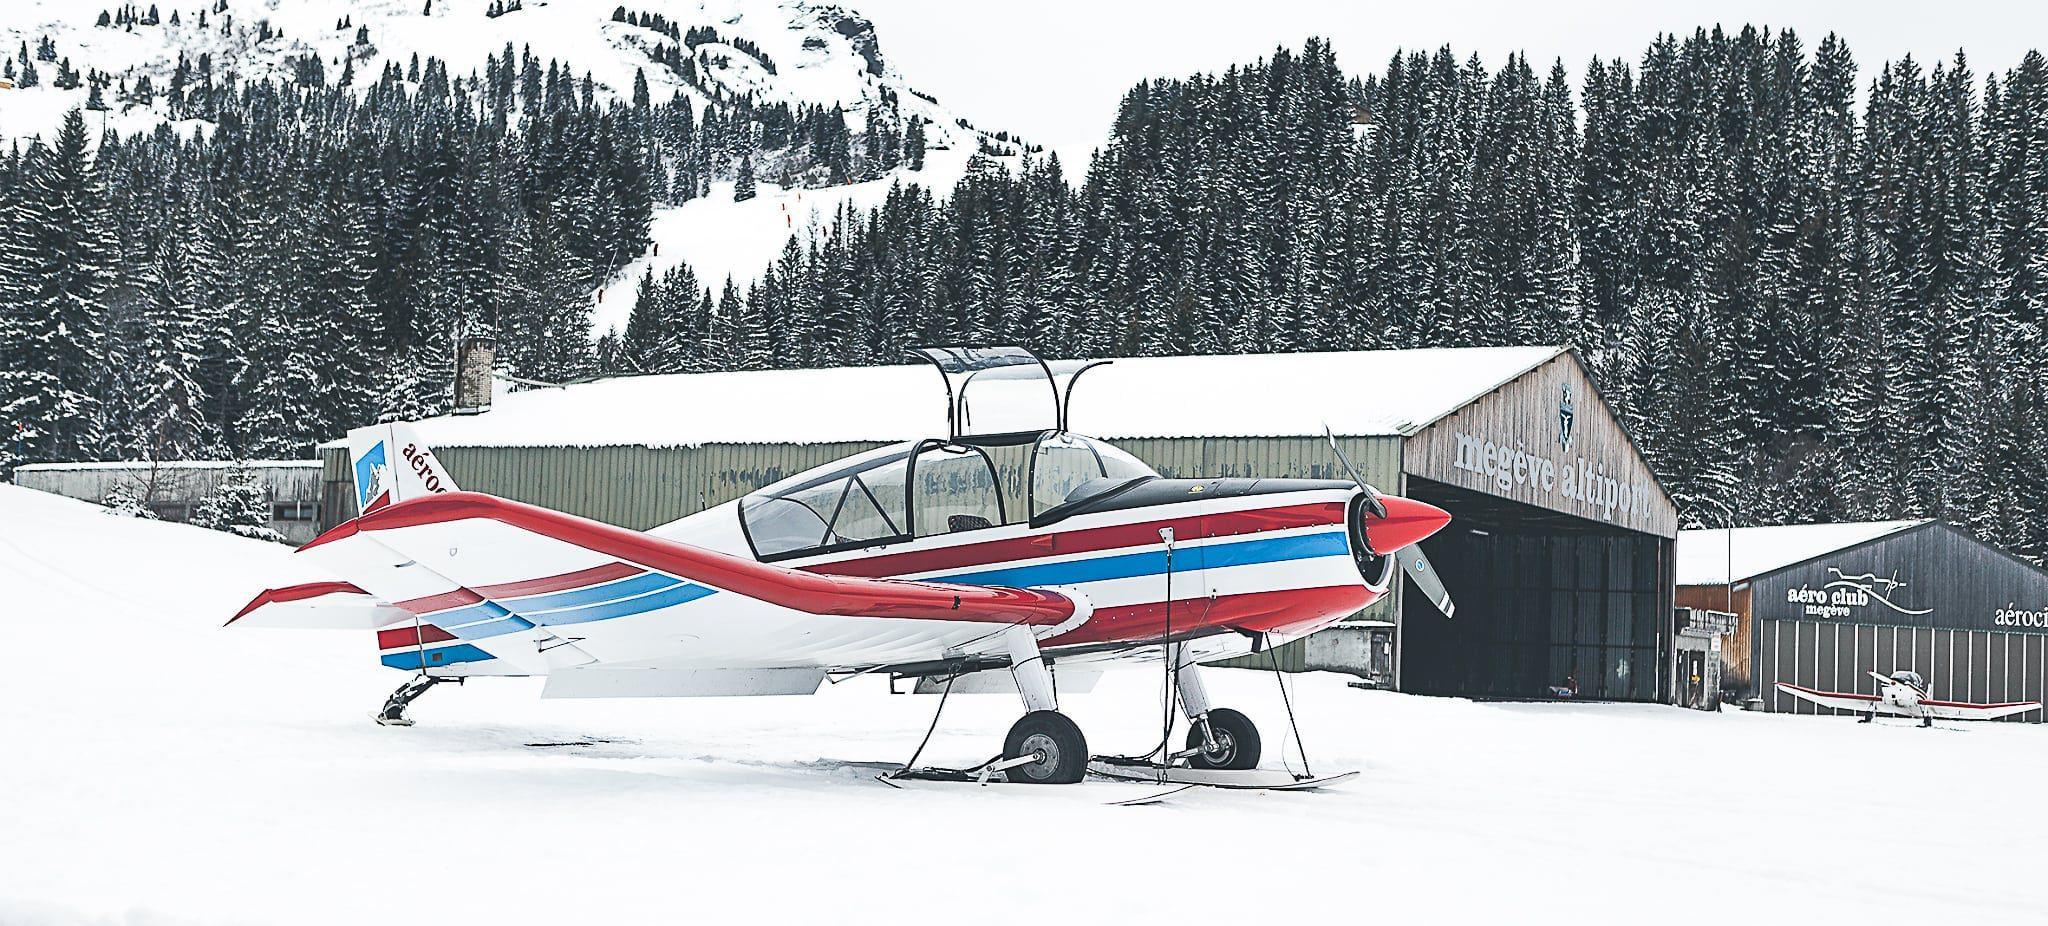 Megève Altiport Airplane.